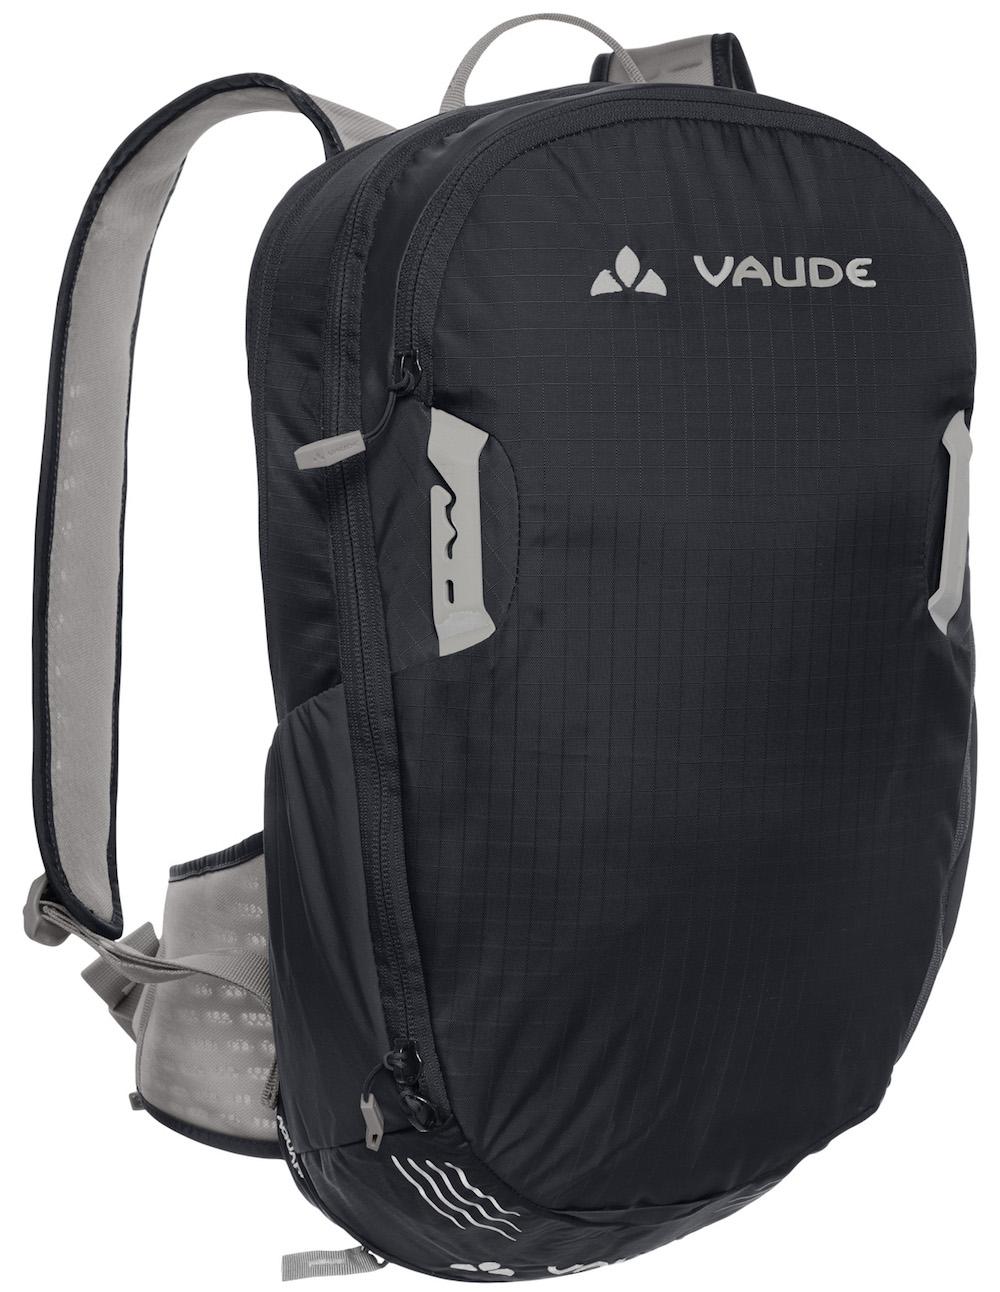 Vaude - Aquarius 9 + 3 - Backpack